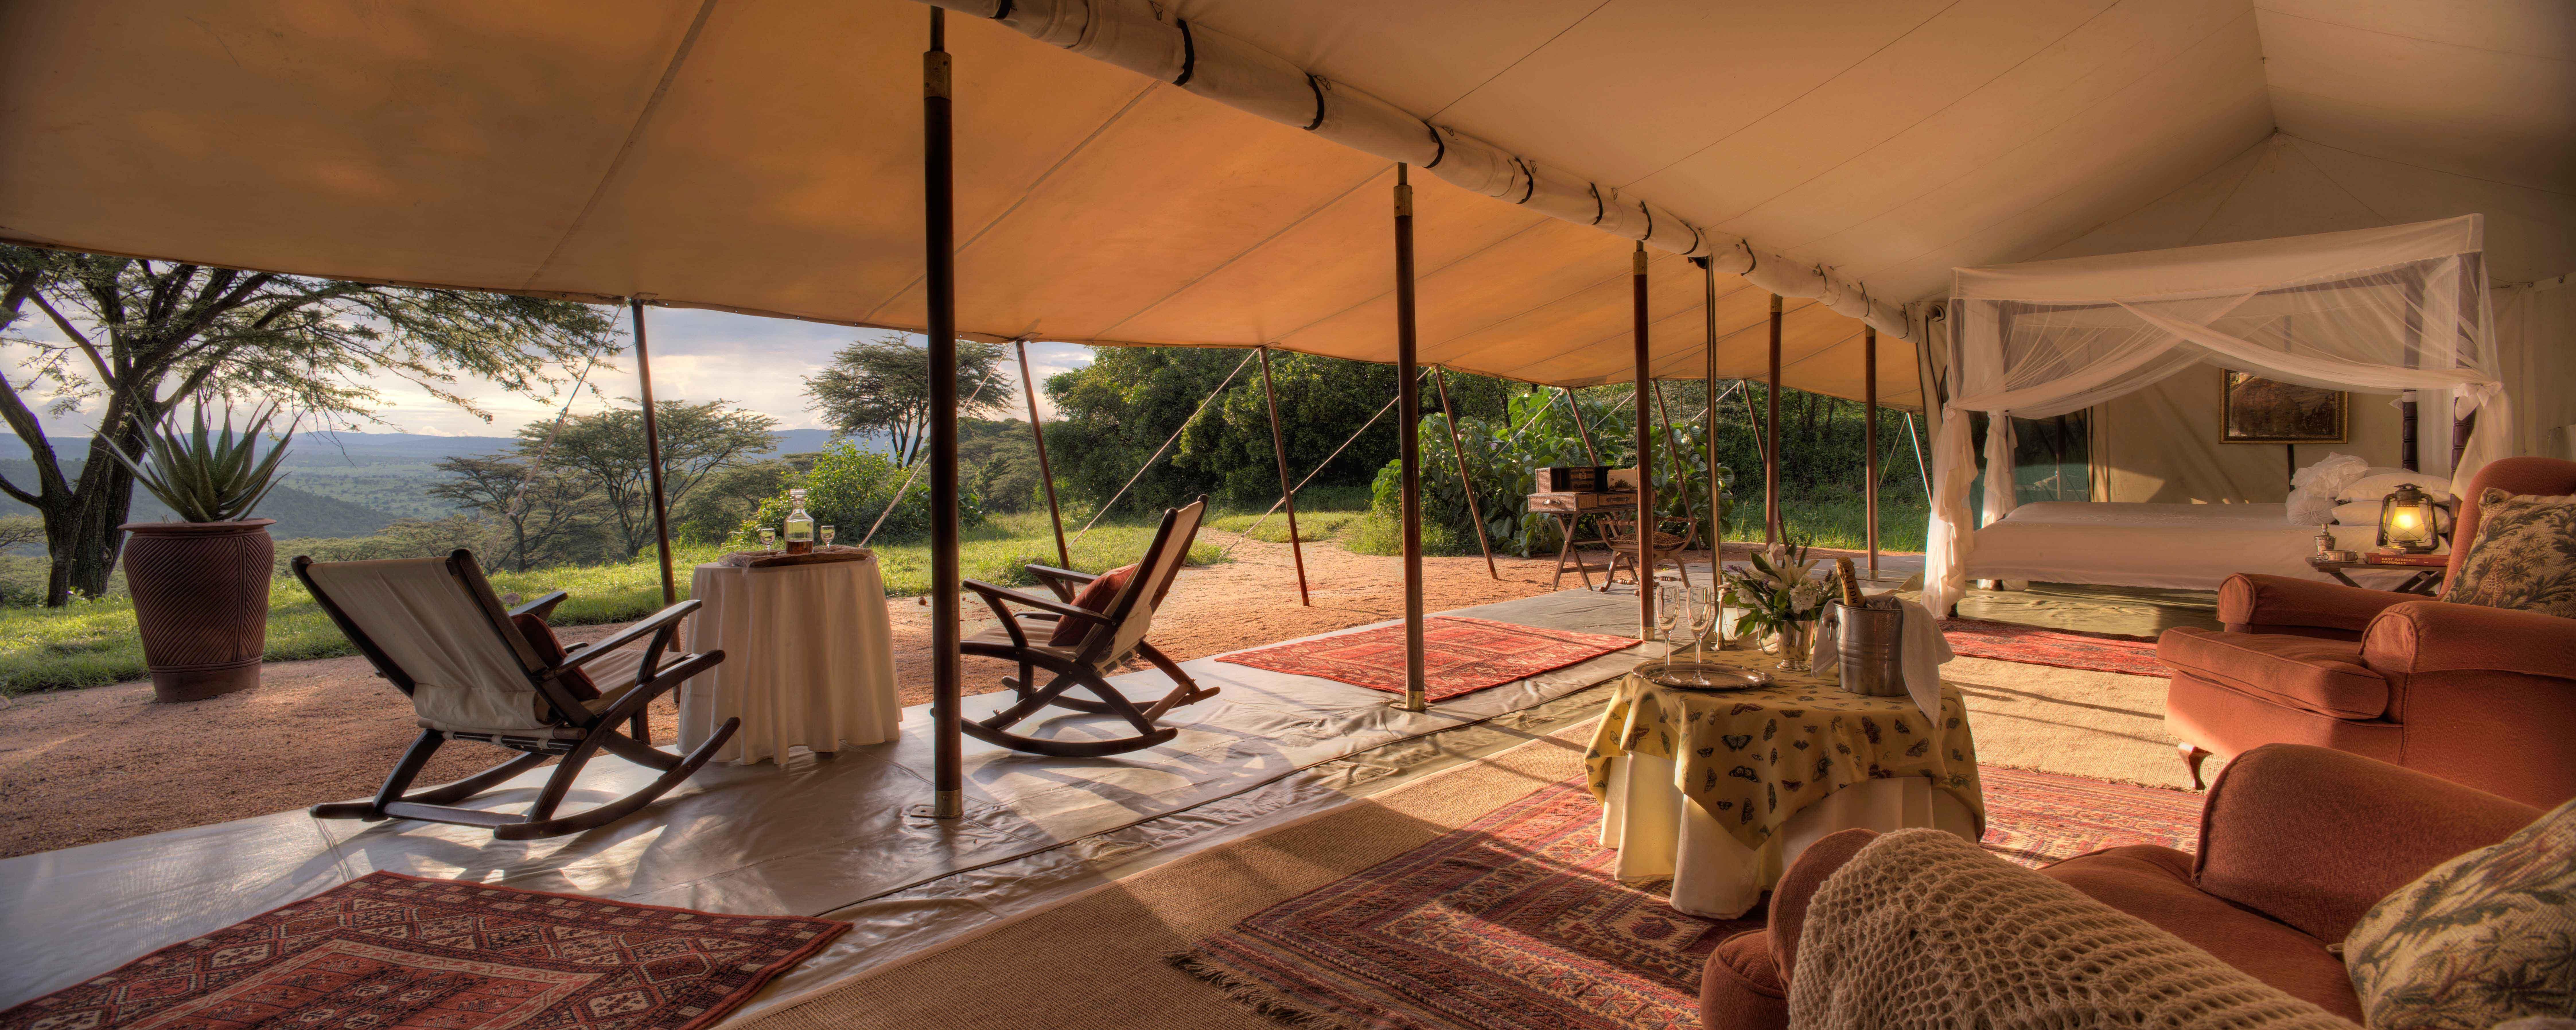 Honeymoon tent at Cottar's 1920's luxury safari lodge in